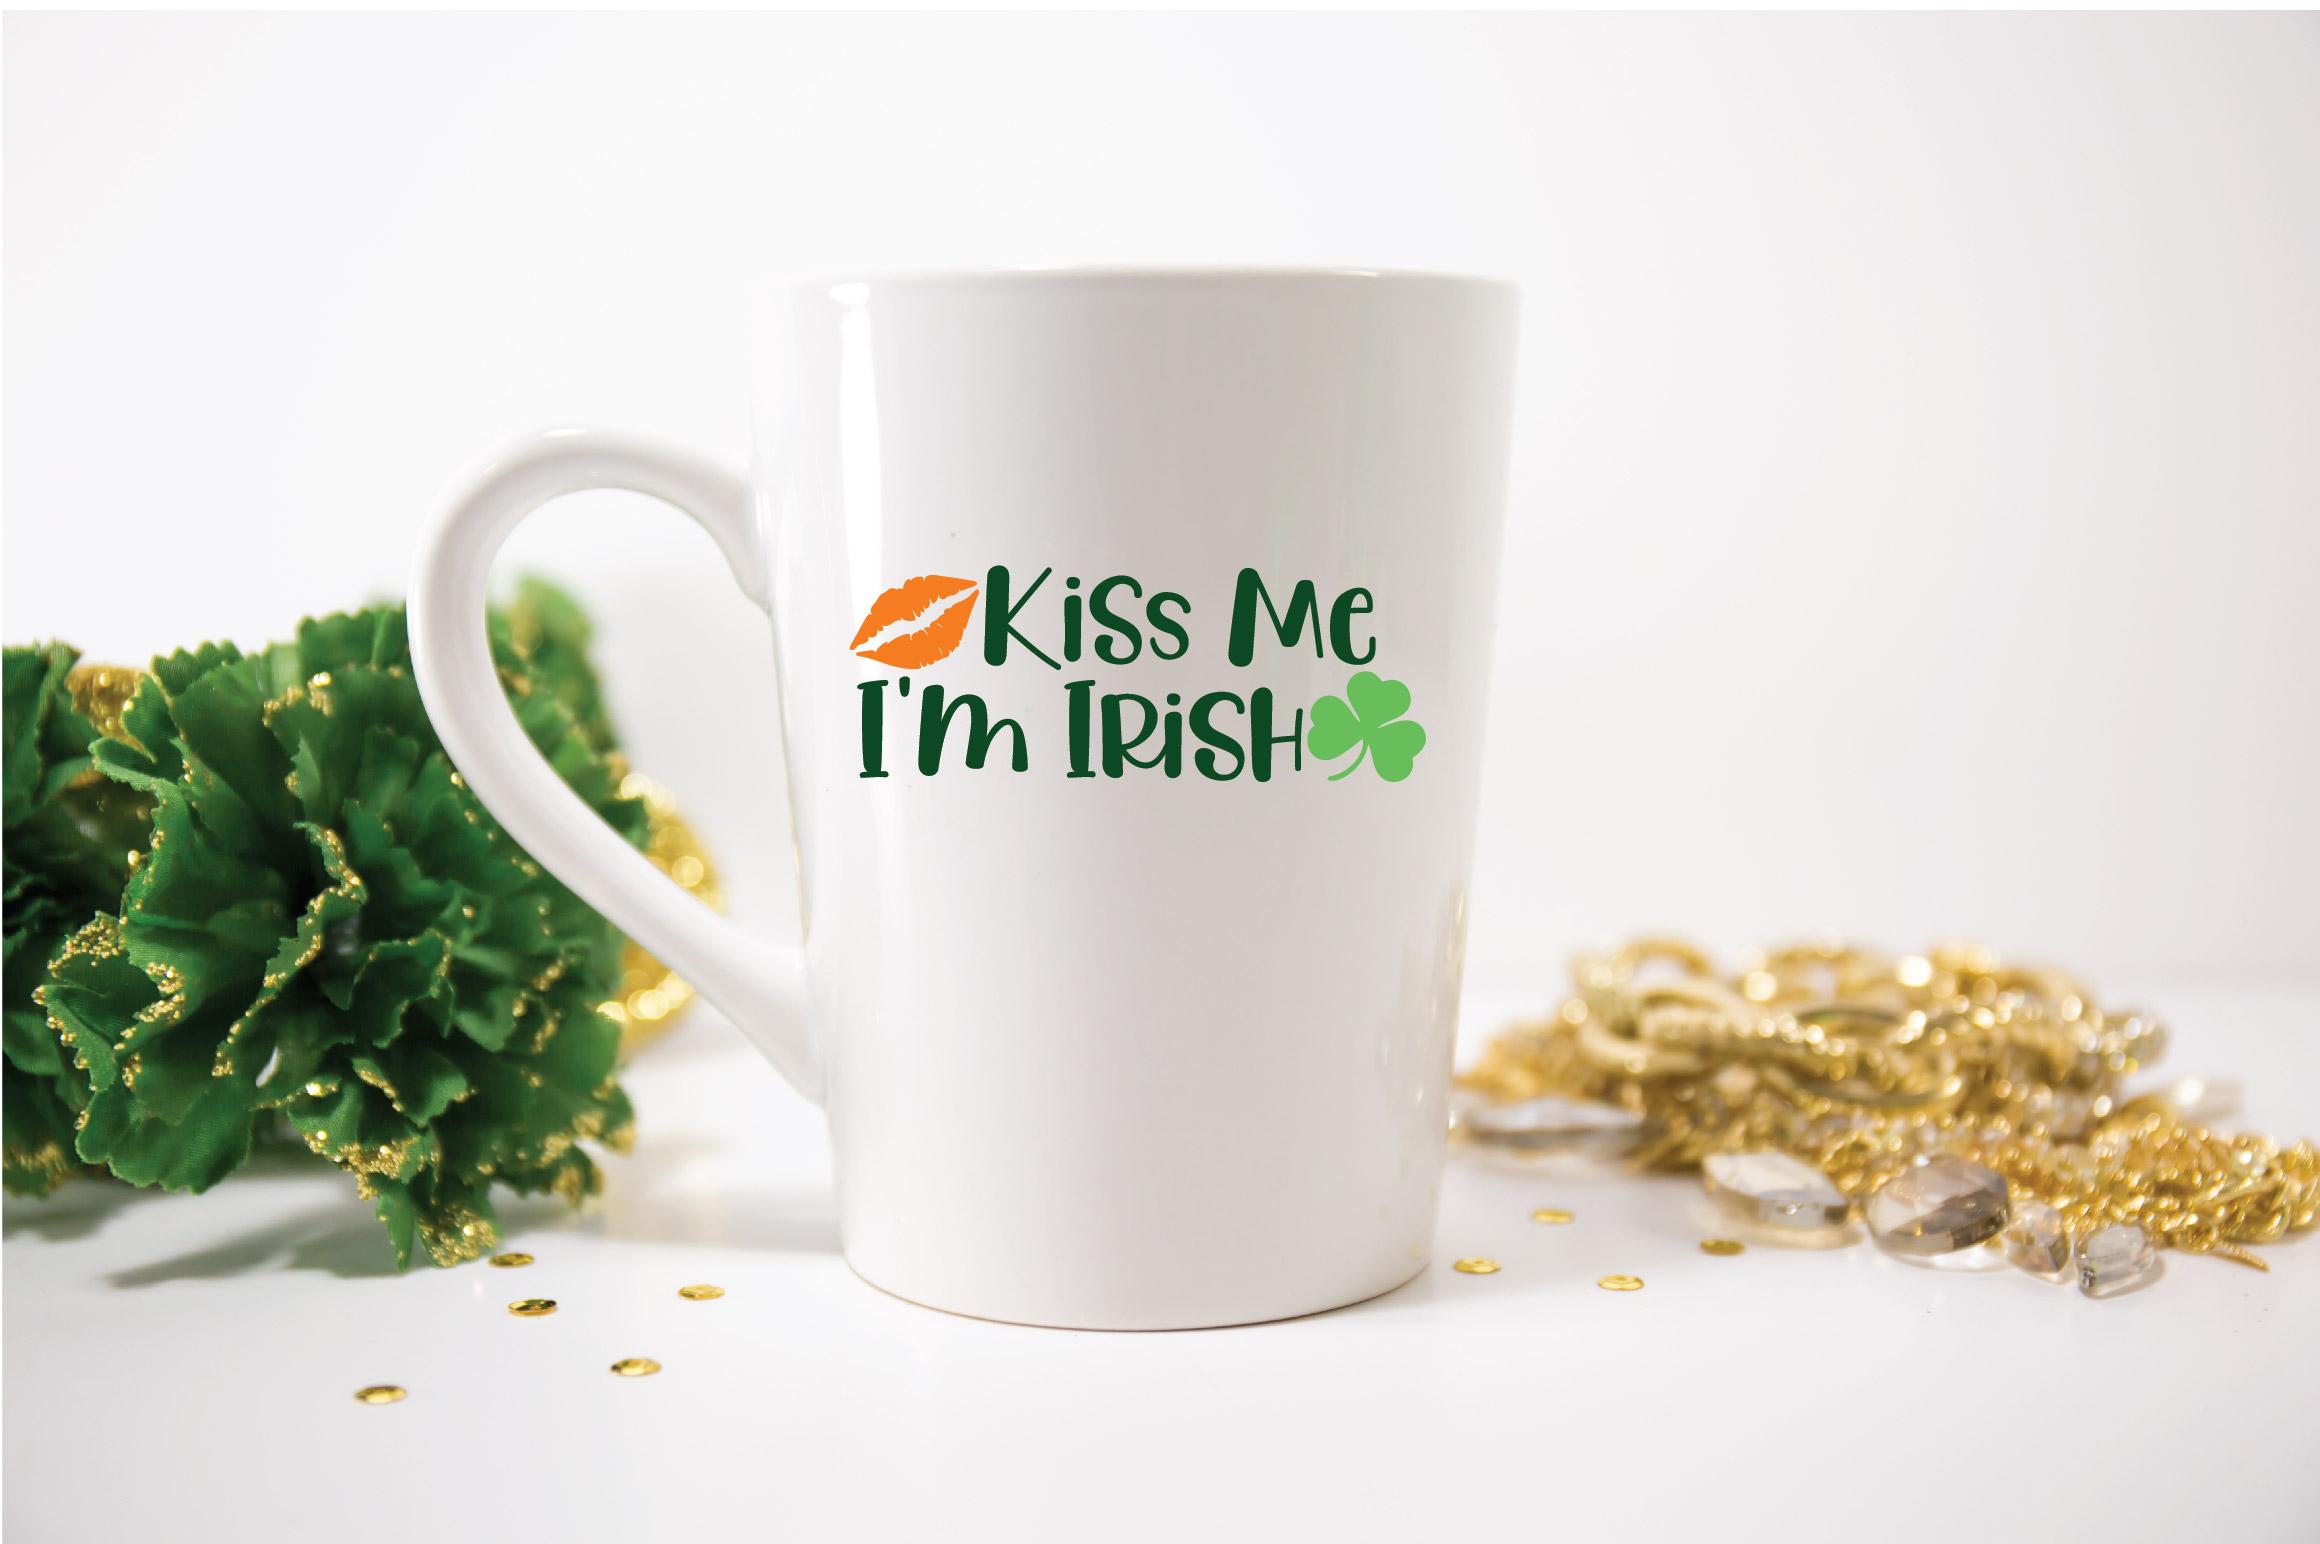 Kiss Me I'm Irish SVG Cut File - St. Patrick's Day SVG - DXF example image 3